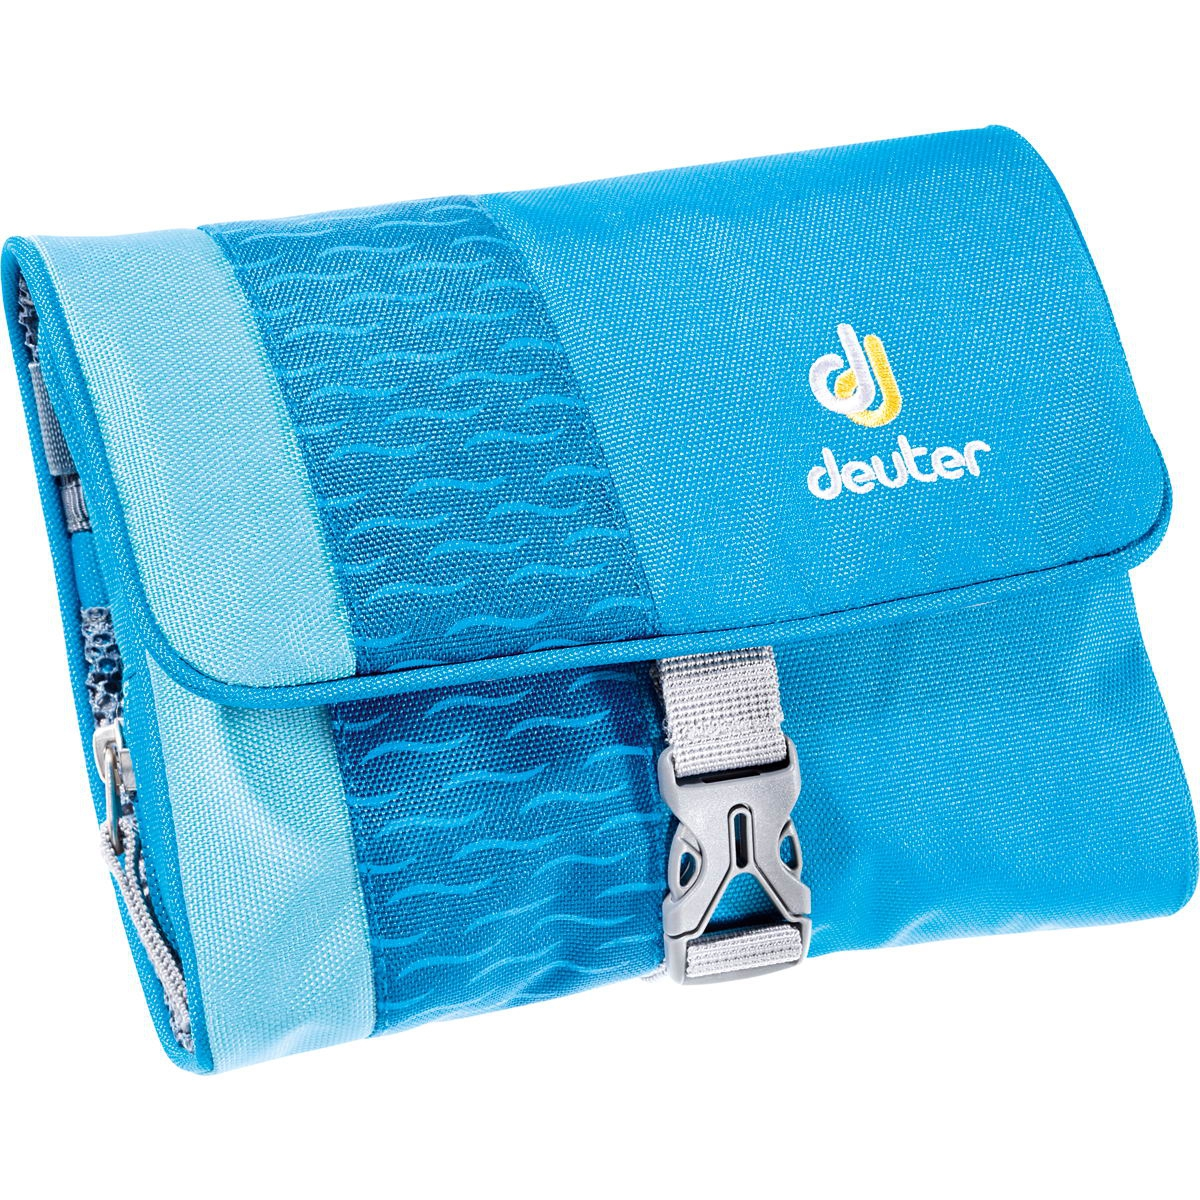 Deuter - Wash Bag I - Kids turquoise - Sponge Bags -